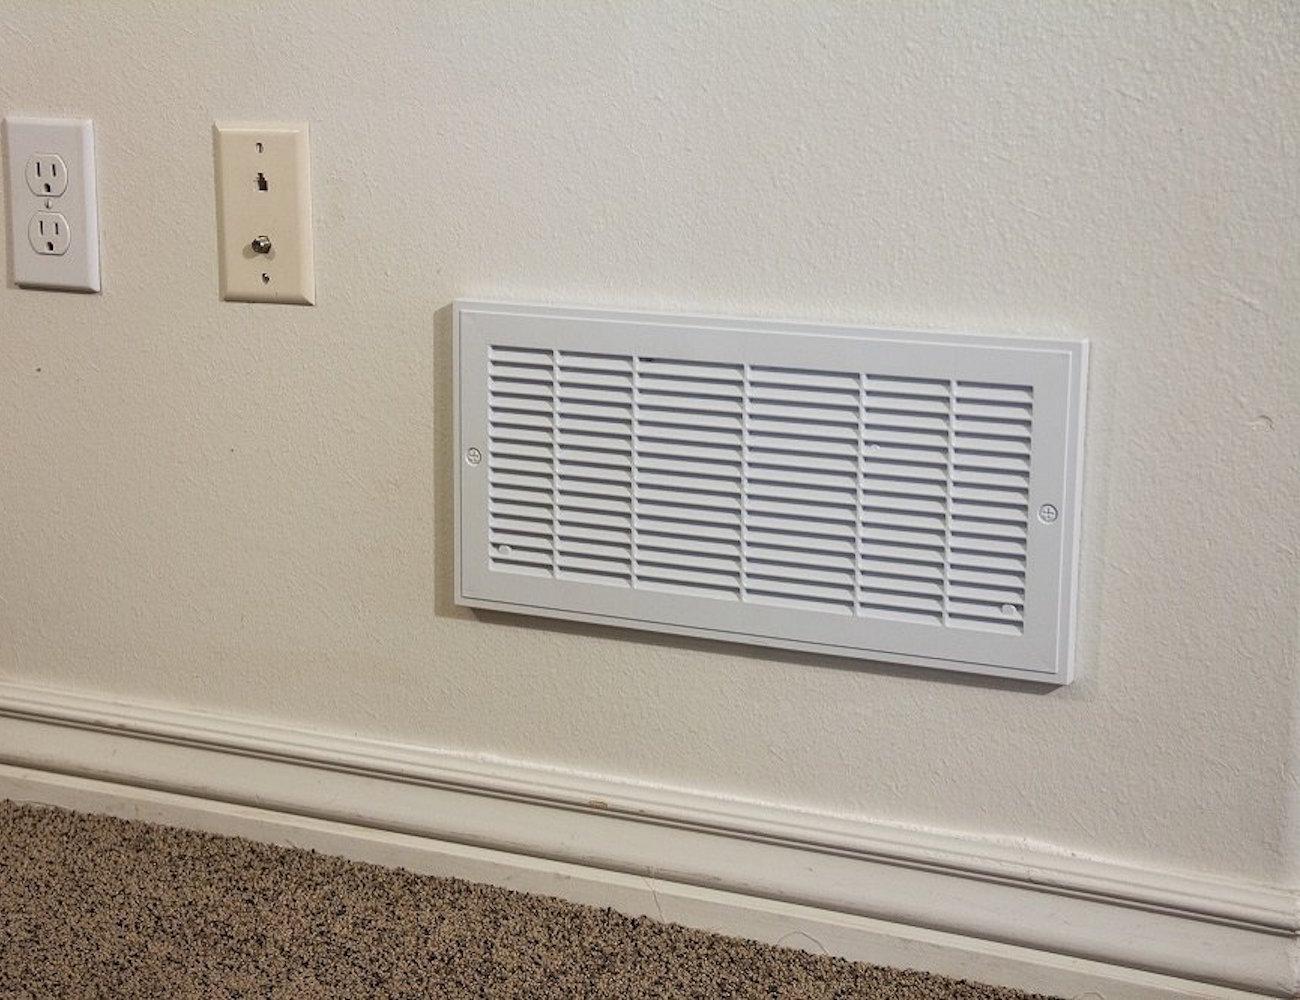 Air Ventilator For Godowns : Air vent hidden safe with rfid lock gadget flow